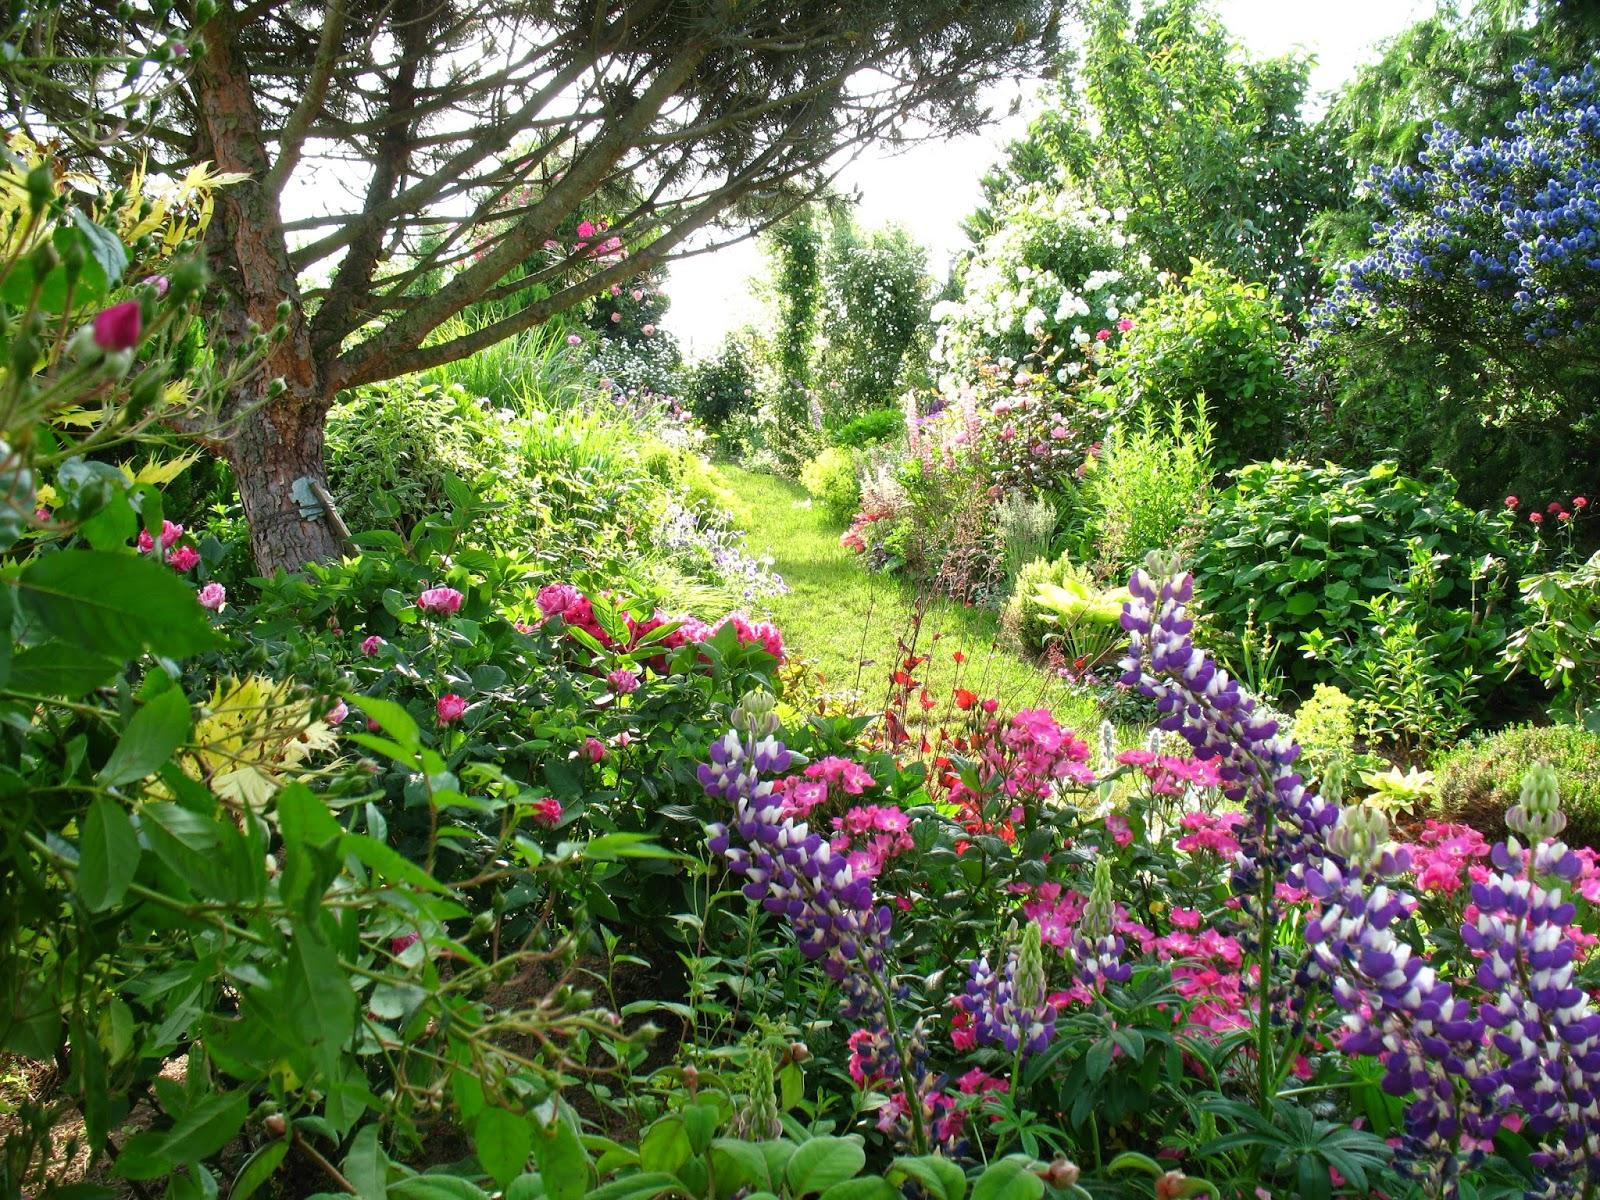 Roses du jardin ch neland ambiance fleurie - Jardin de chen ...